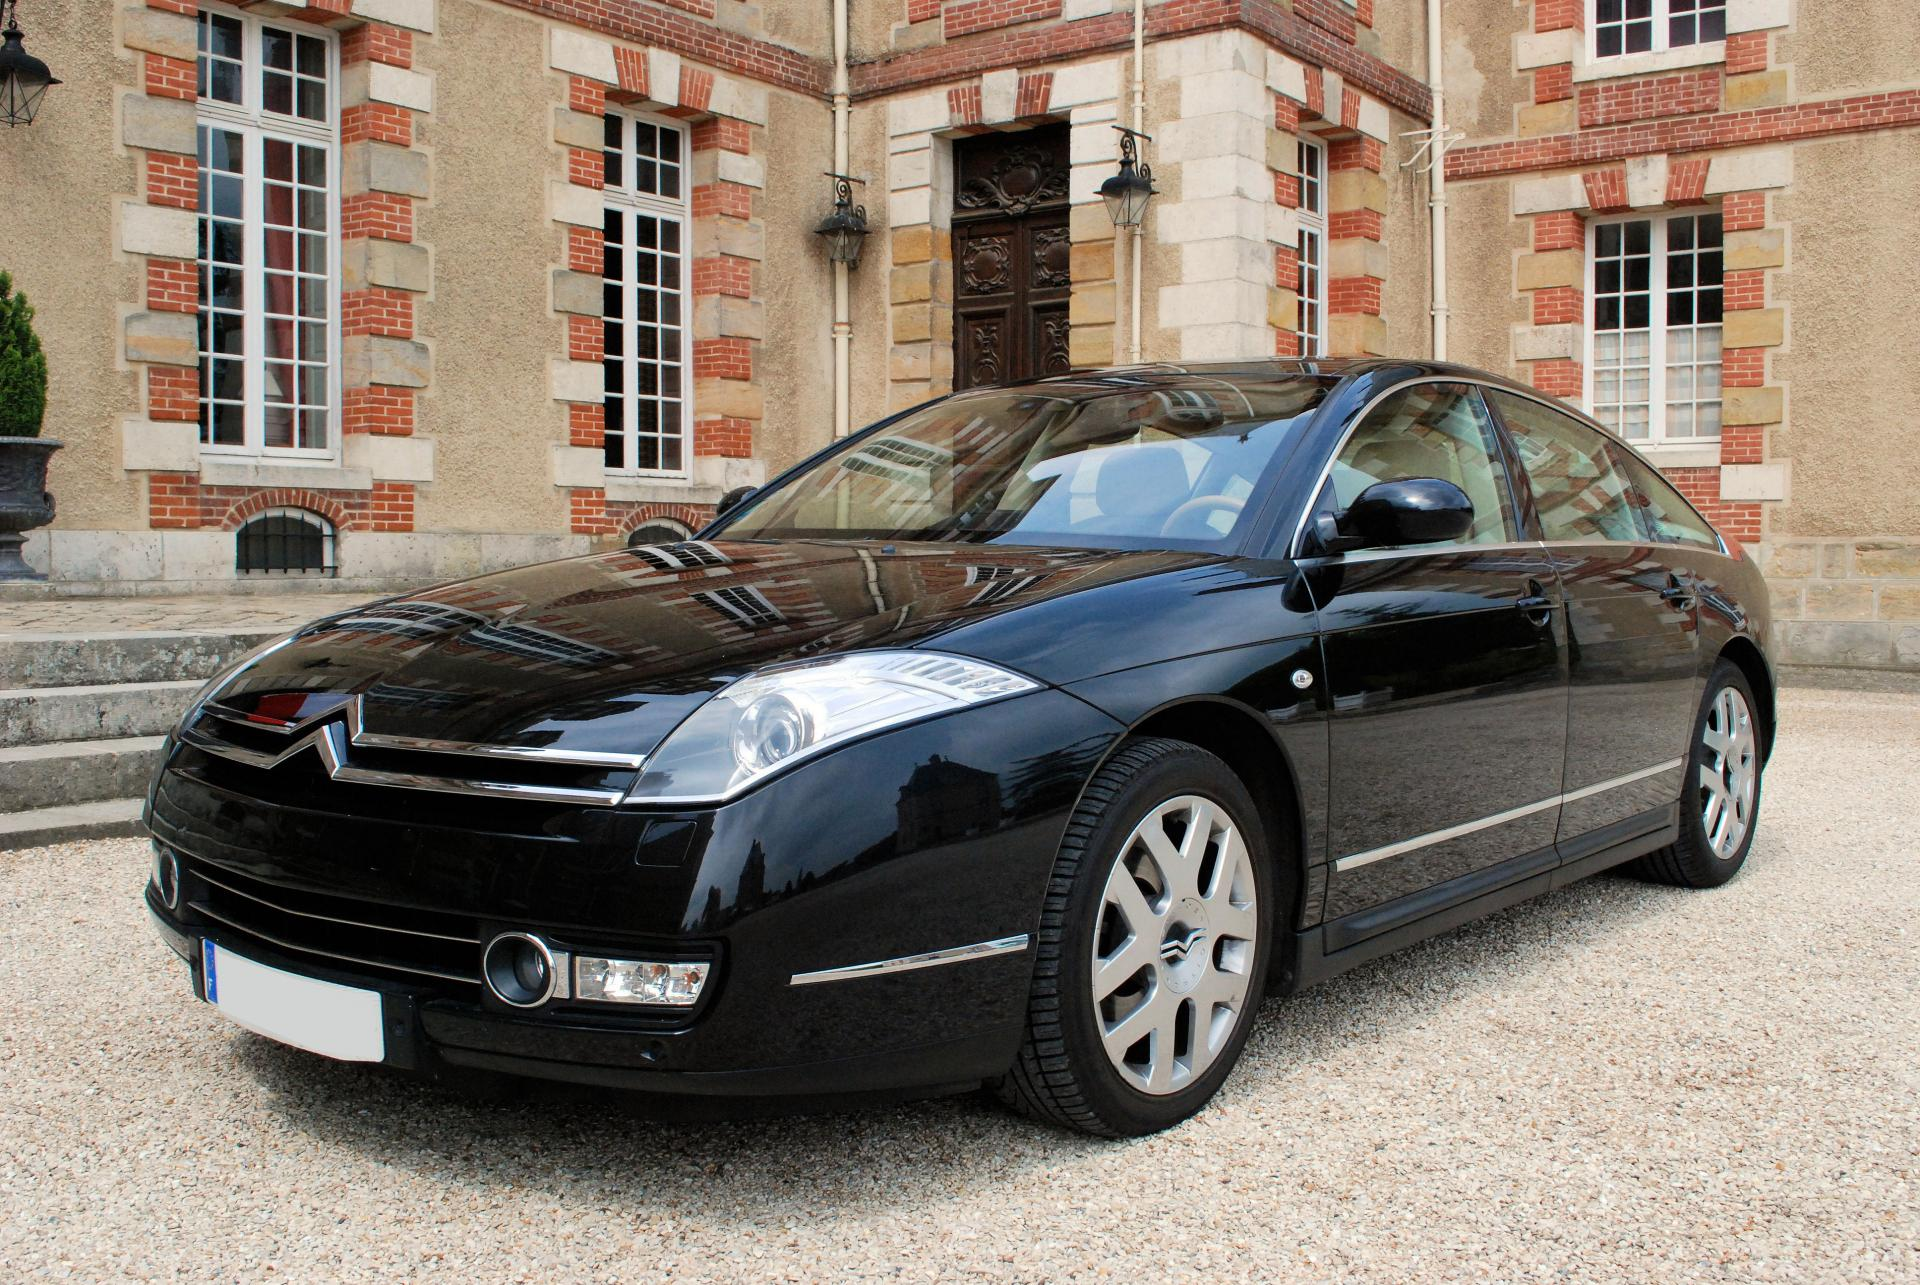 2006 Citroën C 6 diesel V6 Hdi 2 7 l